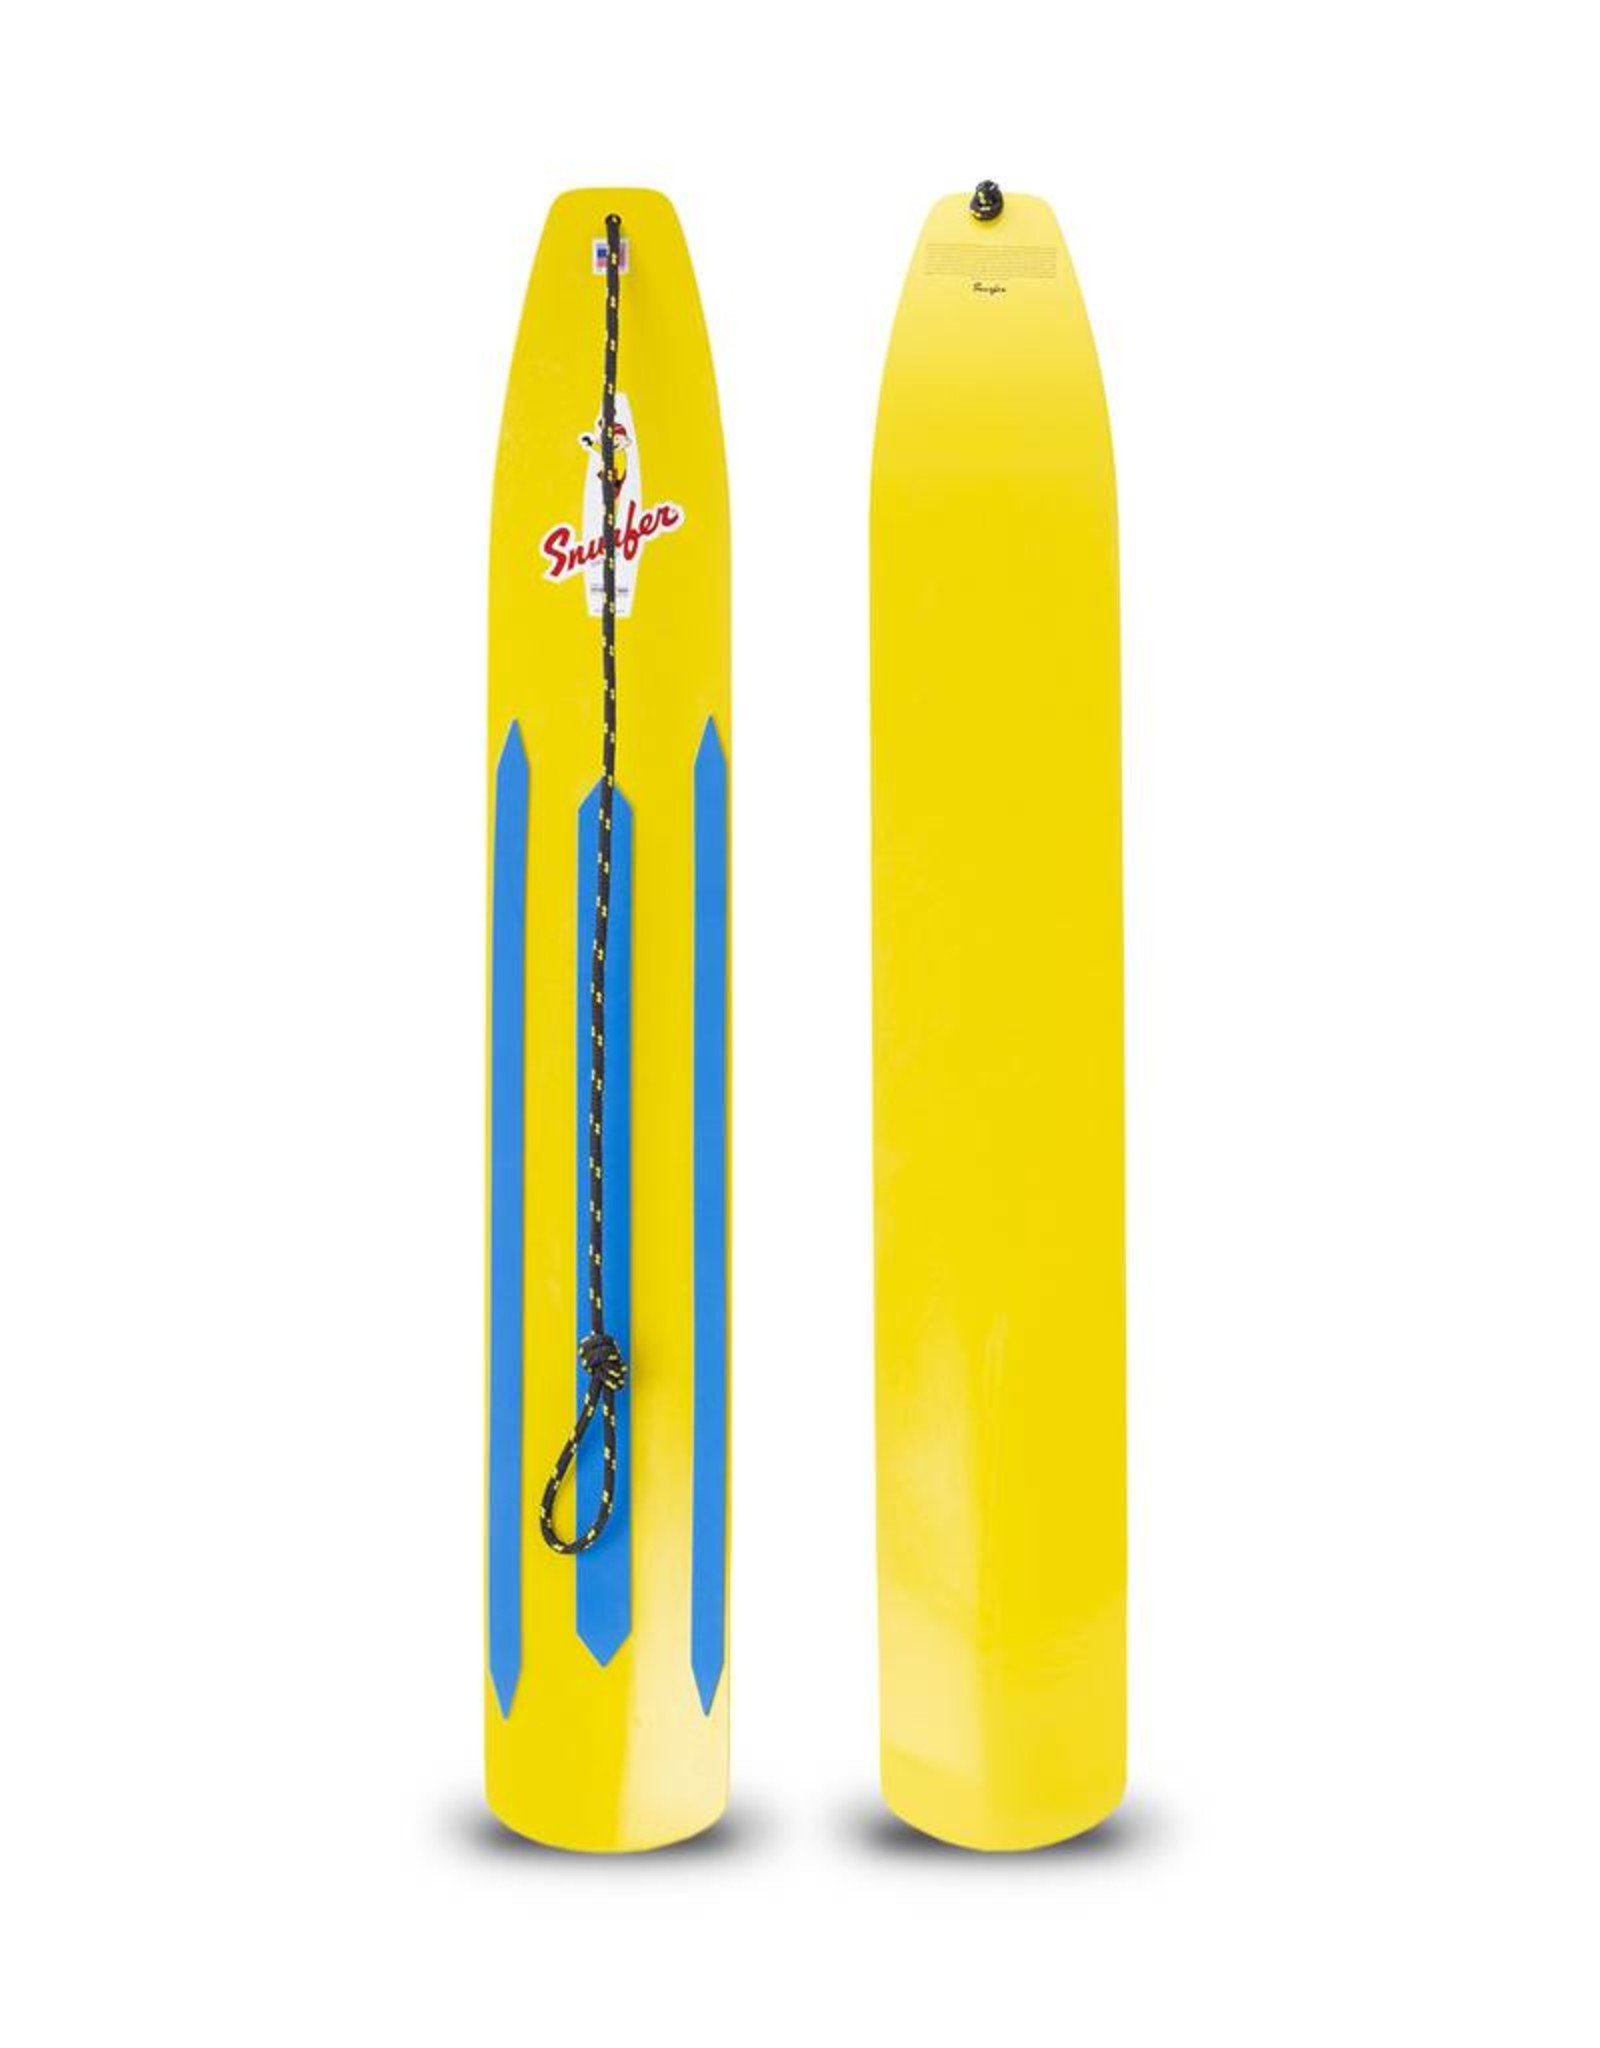 Snurfer Snurfer The Classic Rocket Snow Surfer Gelb